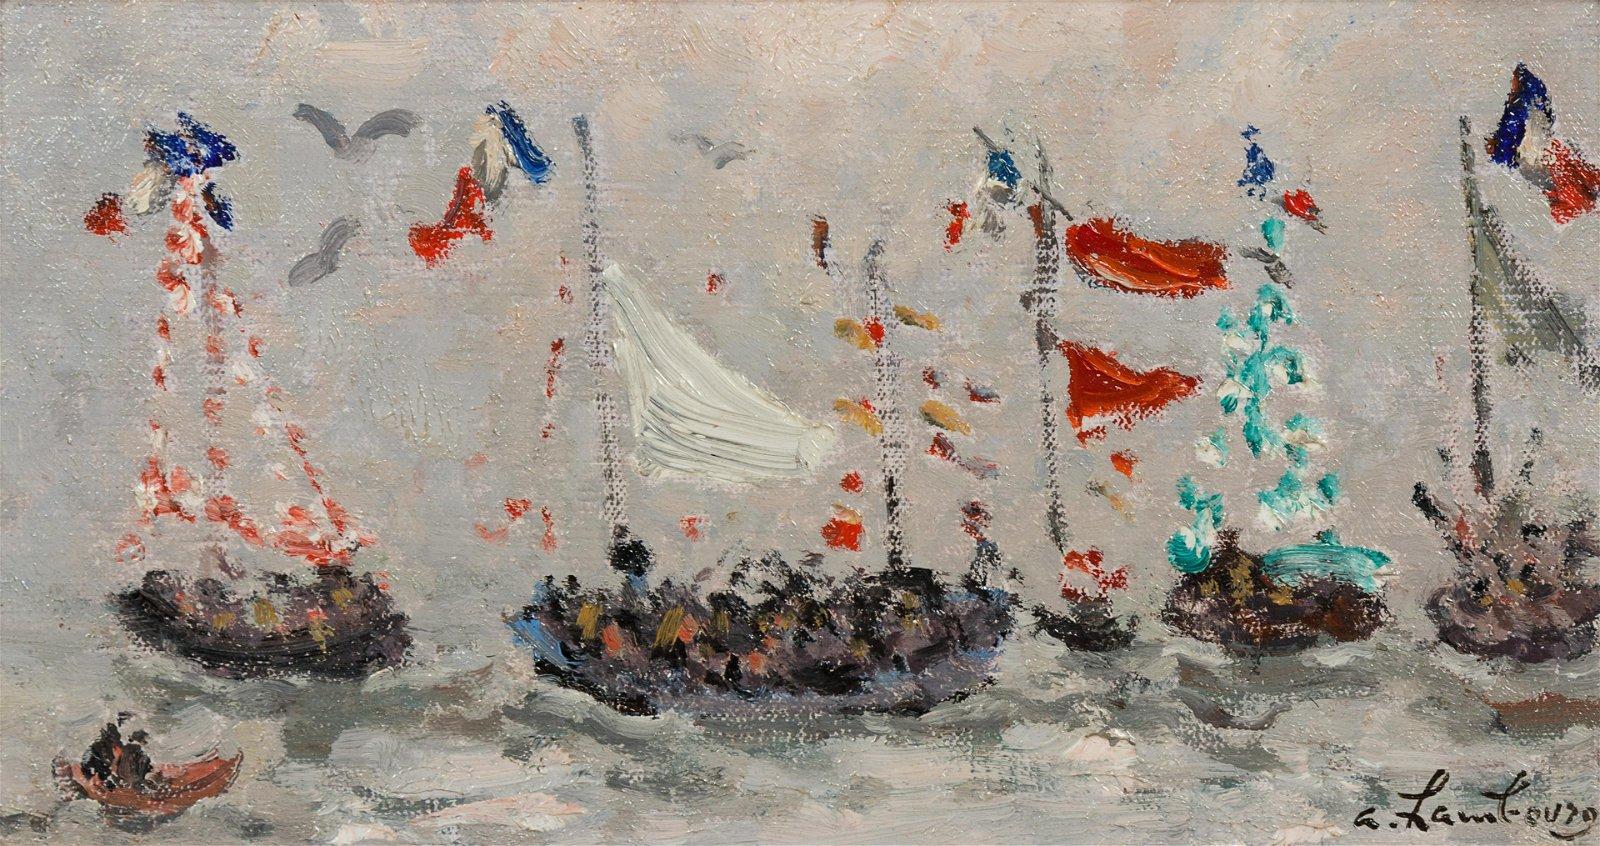 Andre Hambourg (French, 1909-1999) Bateaux en fete